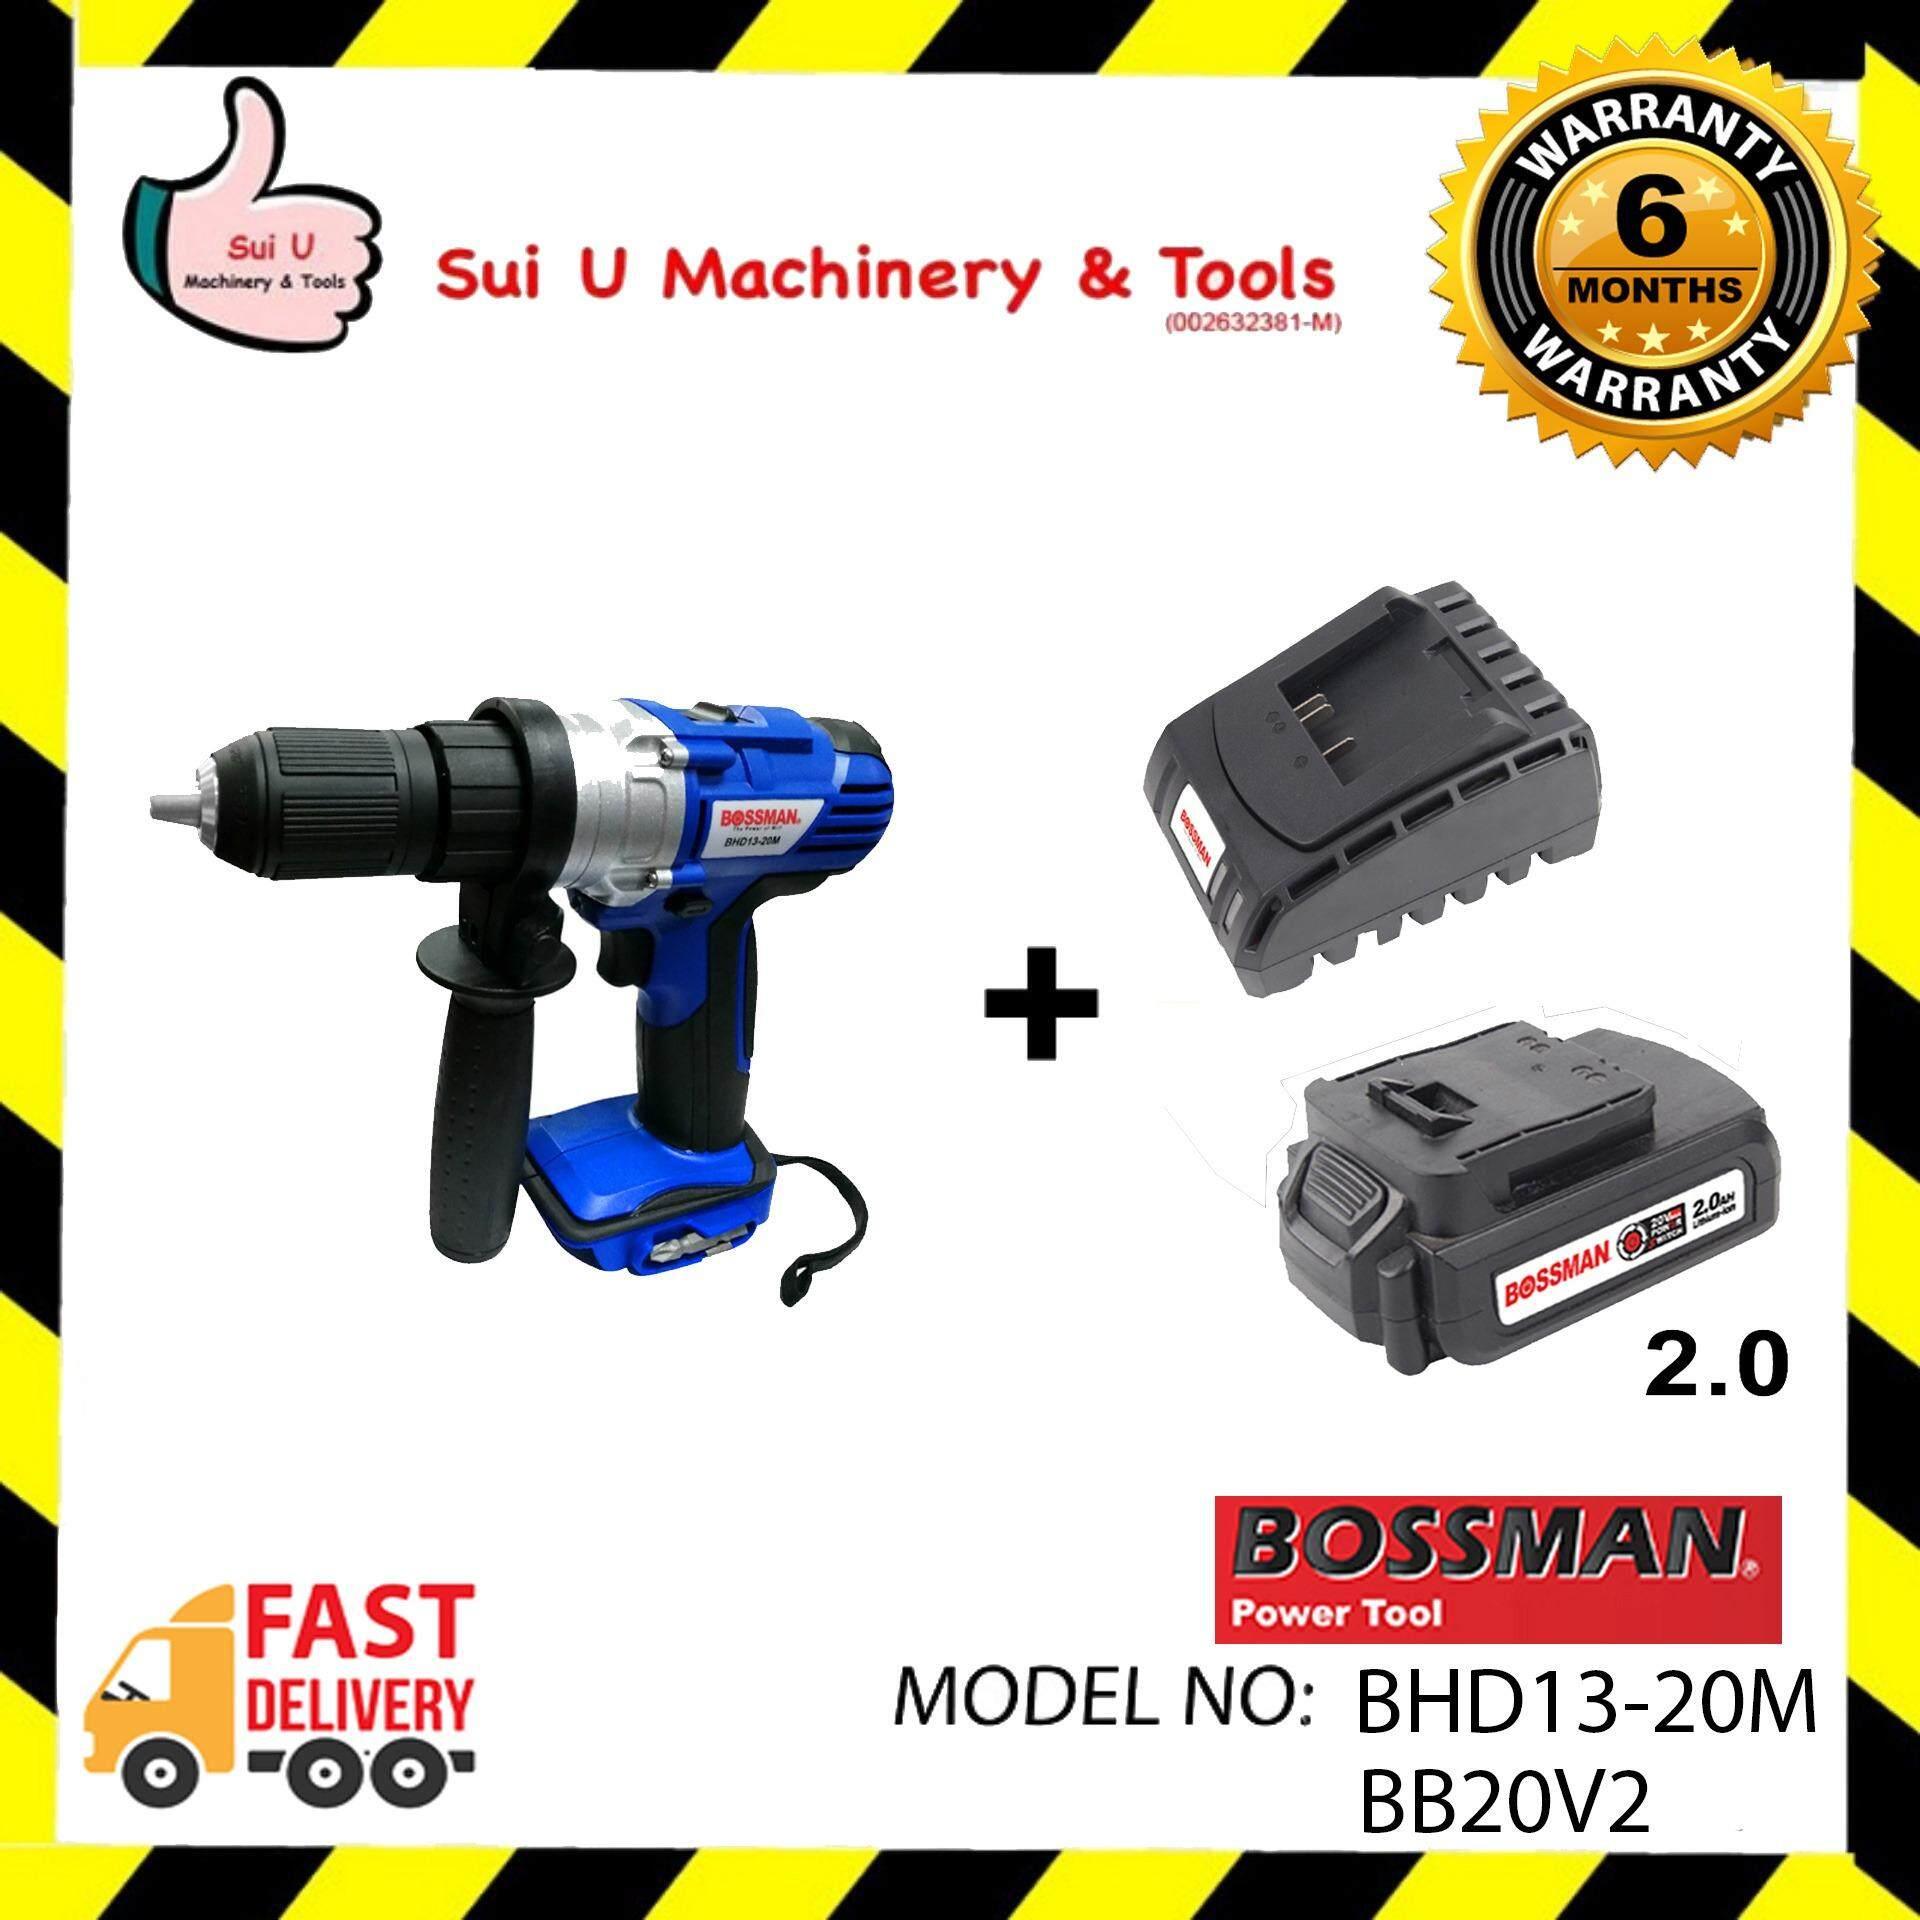 Bossman BHD13-20M 20V Cordless Hammer + Battery 2.0